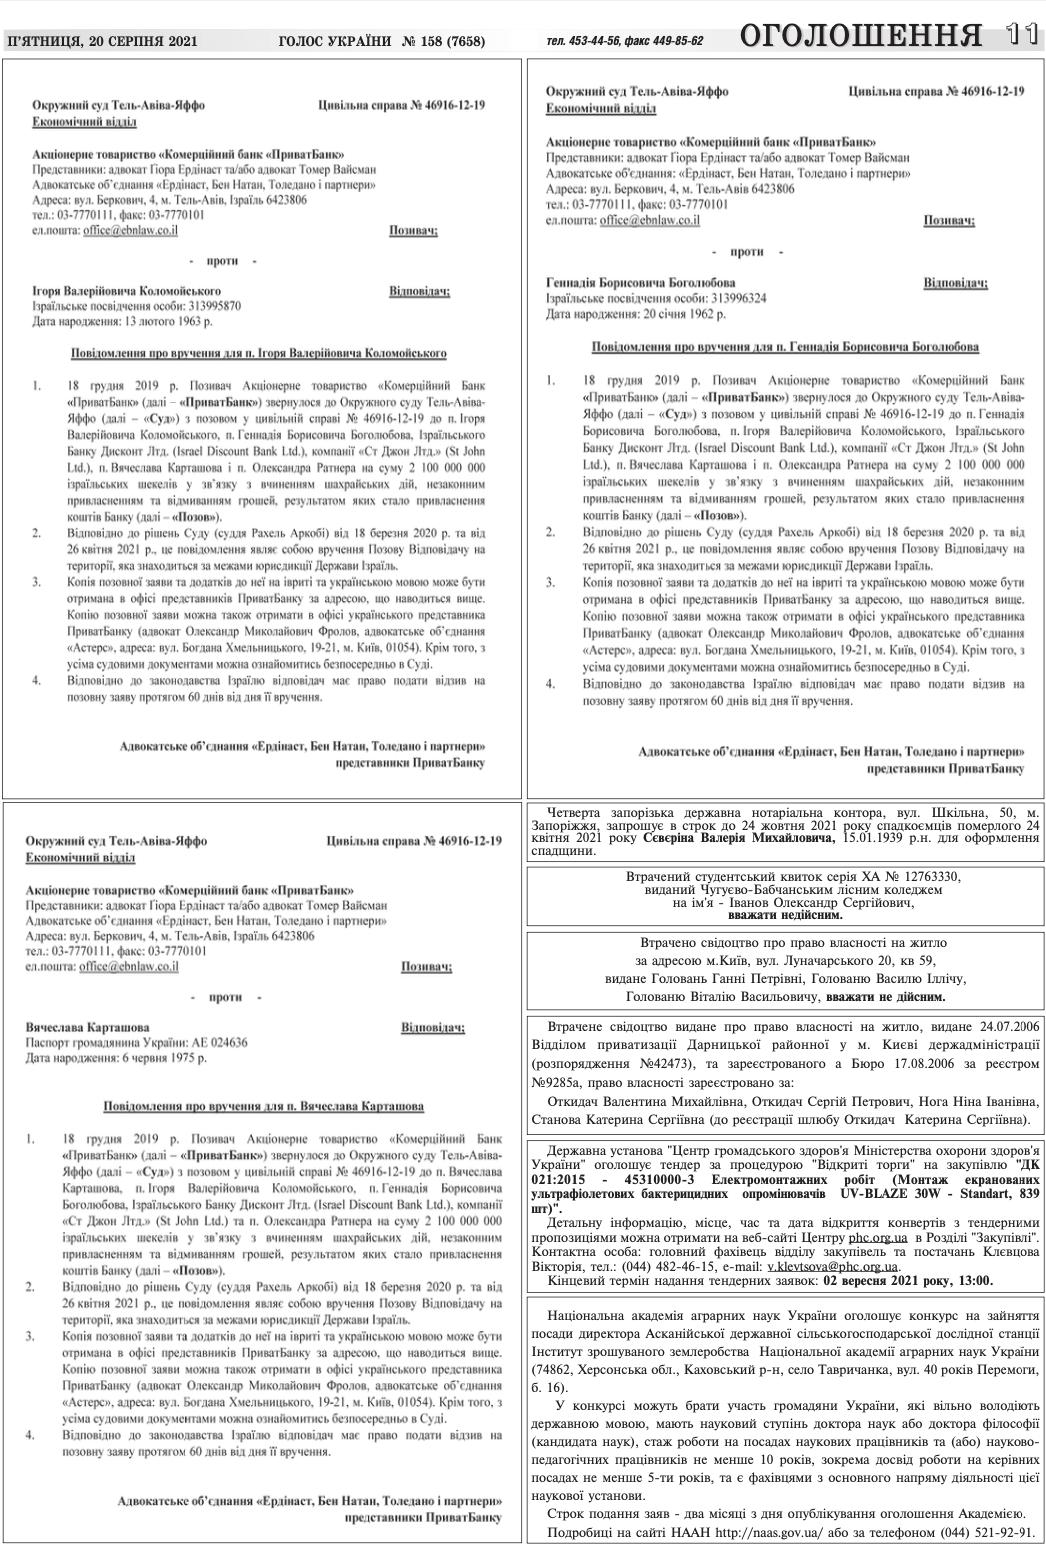 PrivatBank completes service of Israel claim on Igor Kolomoisky, Gennadiy Bogolyubov and Vyacheslav Kartashov by publication and courier delivery in Ukraine